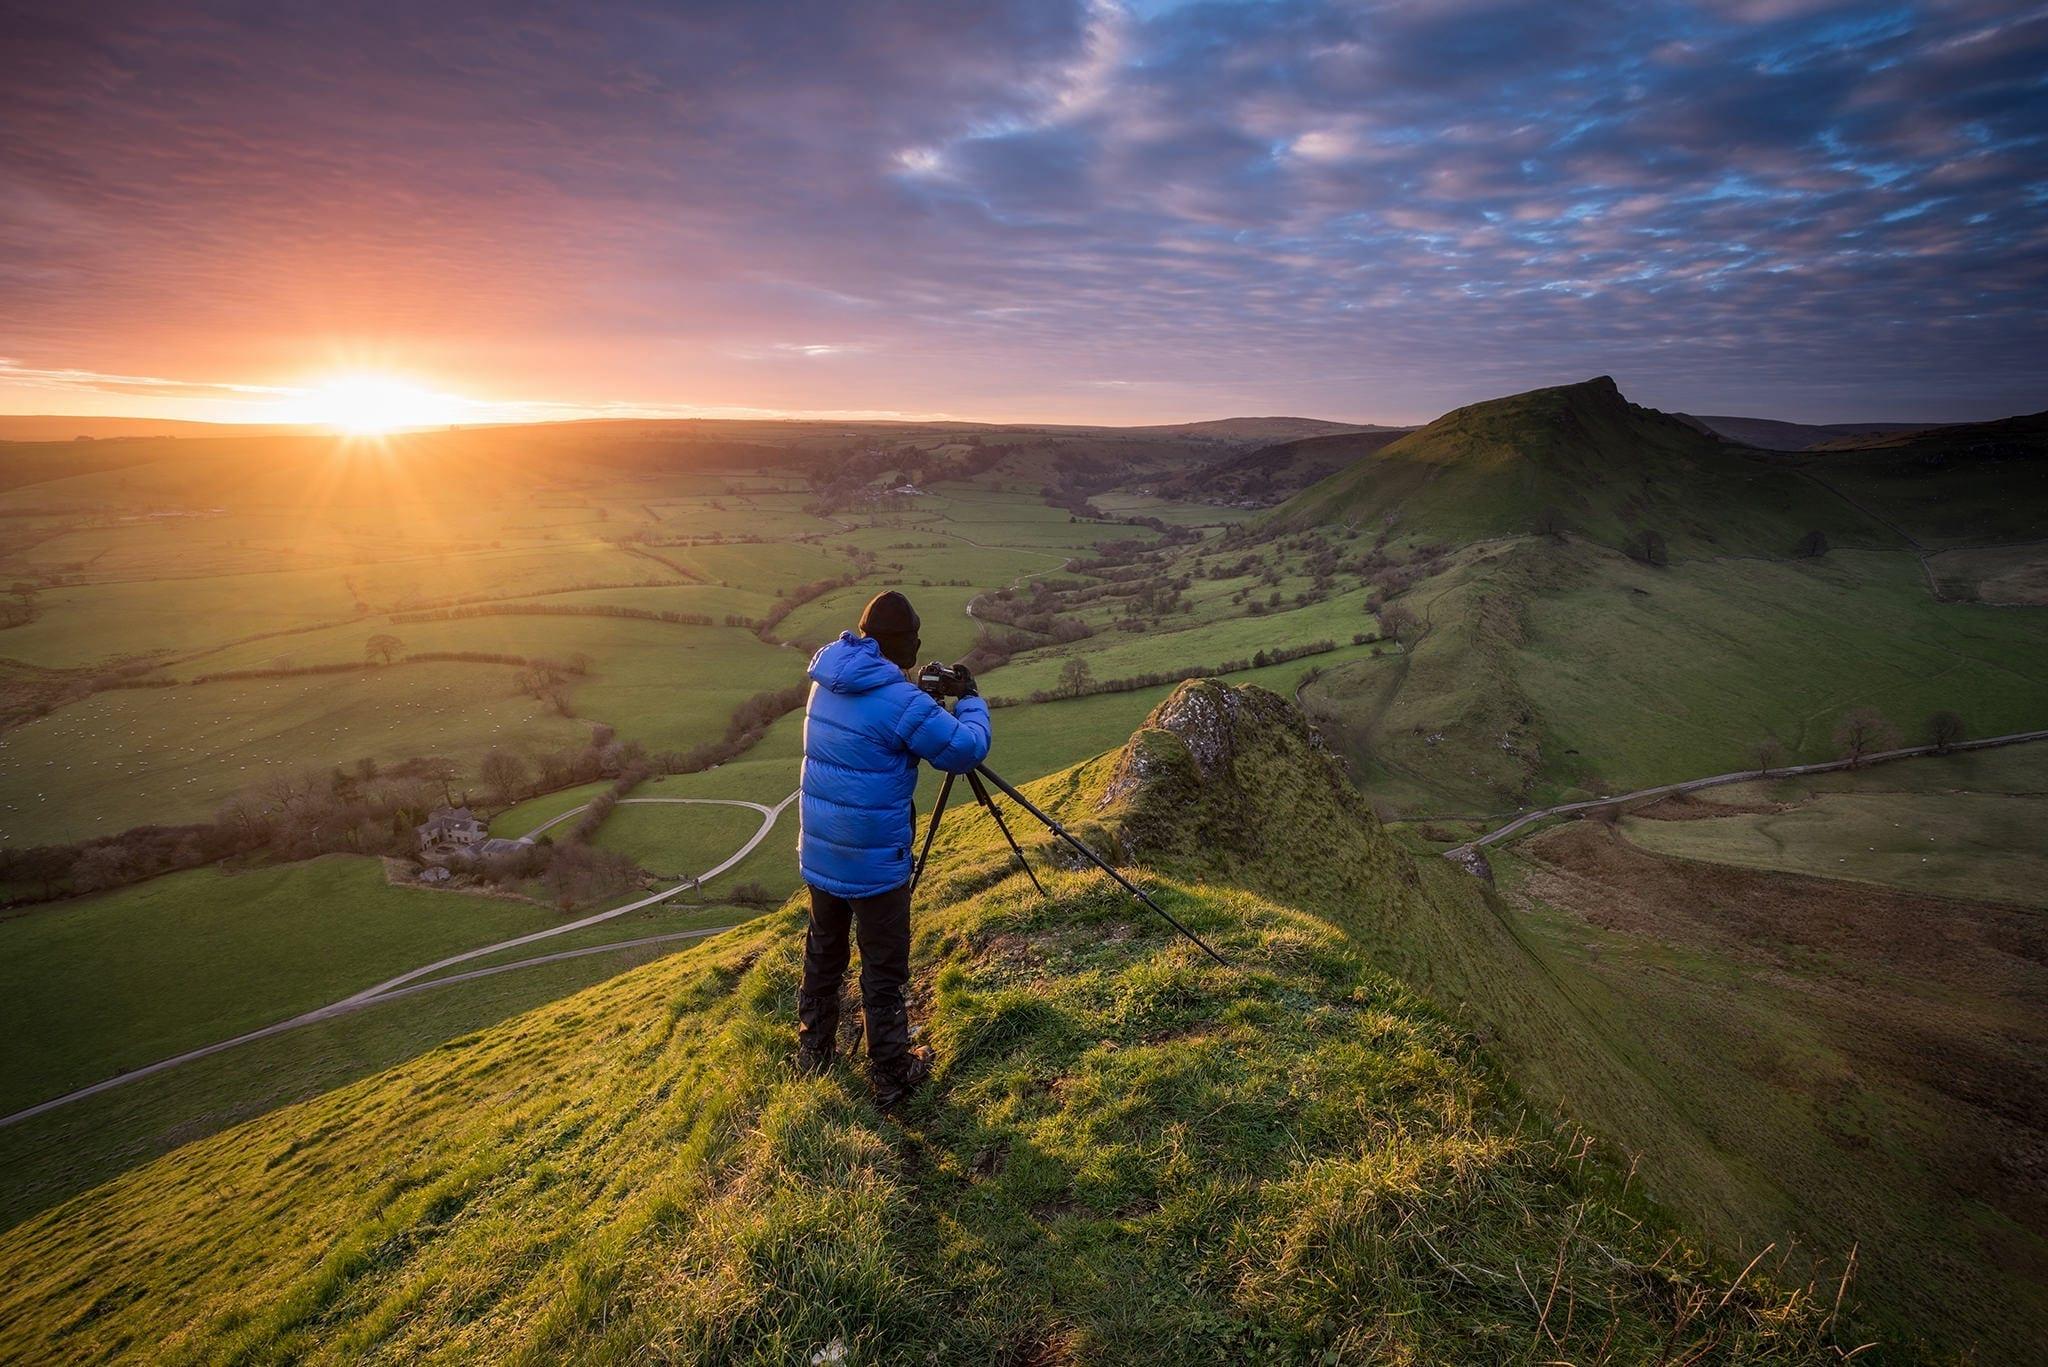 Peak District Photography Workshop - Parkhouse Hill